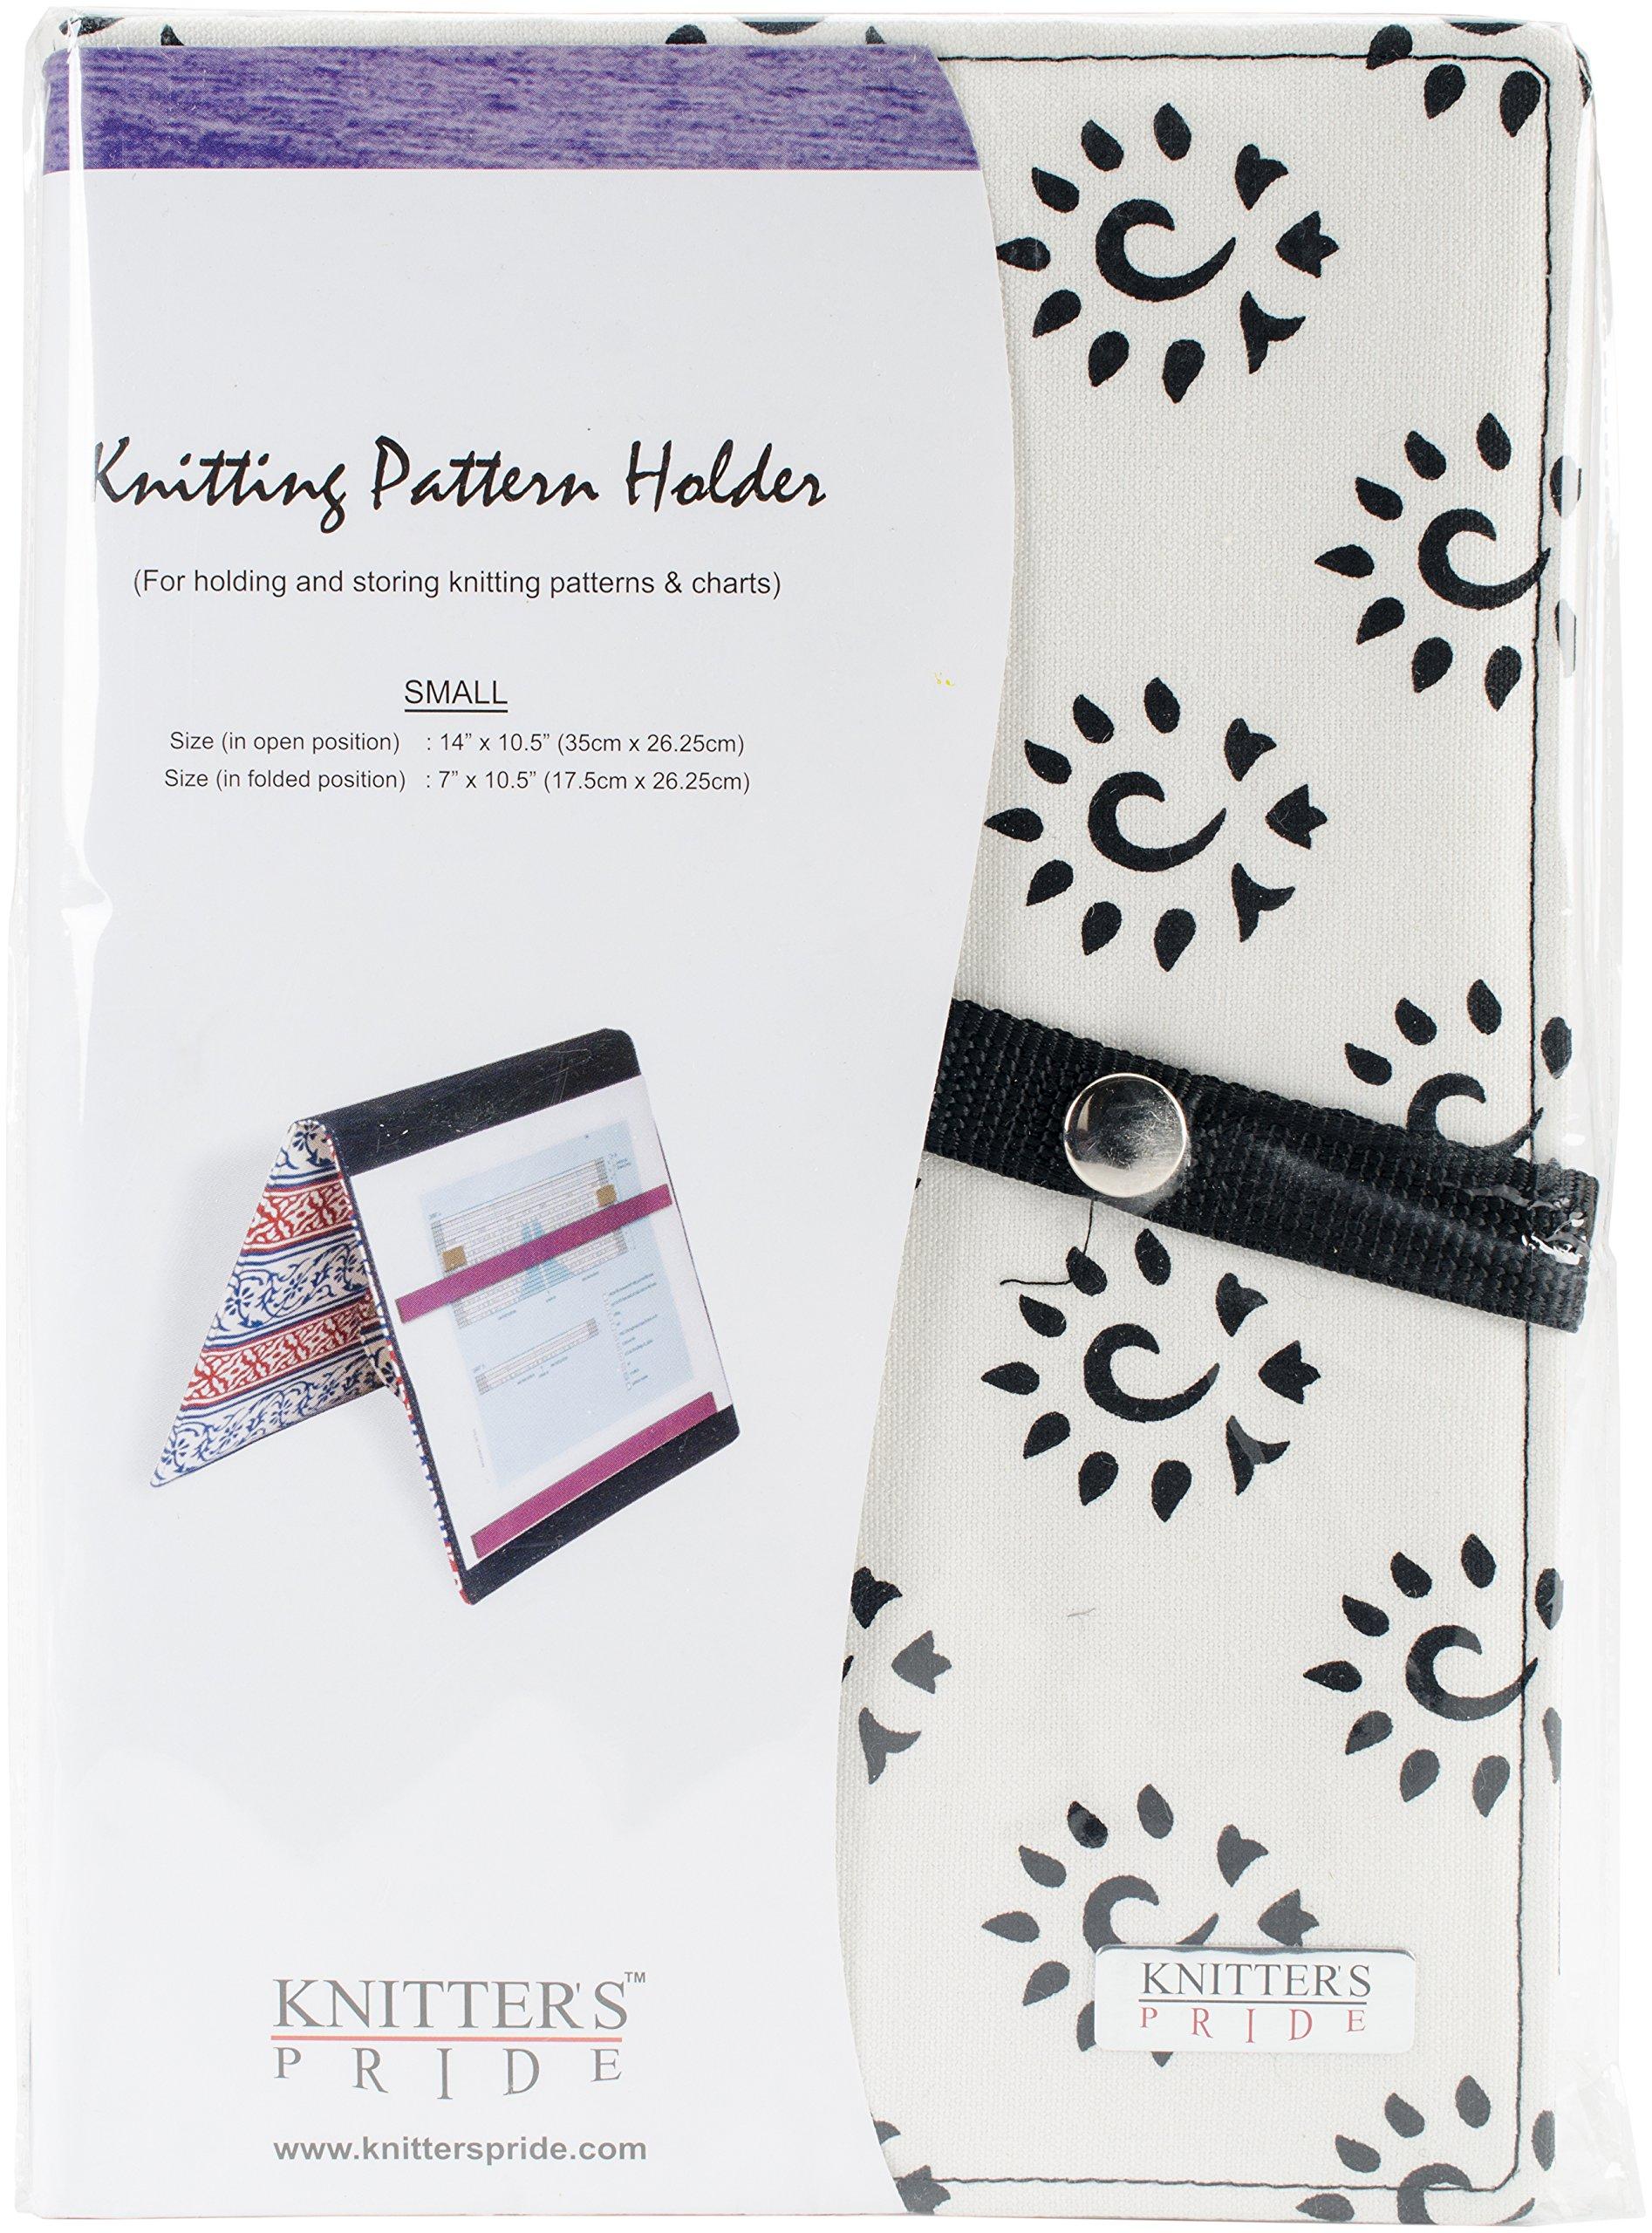 Knitter's Pride KP800354 Fold-Up Knitting Pattern Holder 7''X10.5''-Amber Black Small